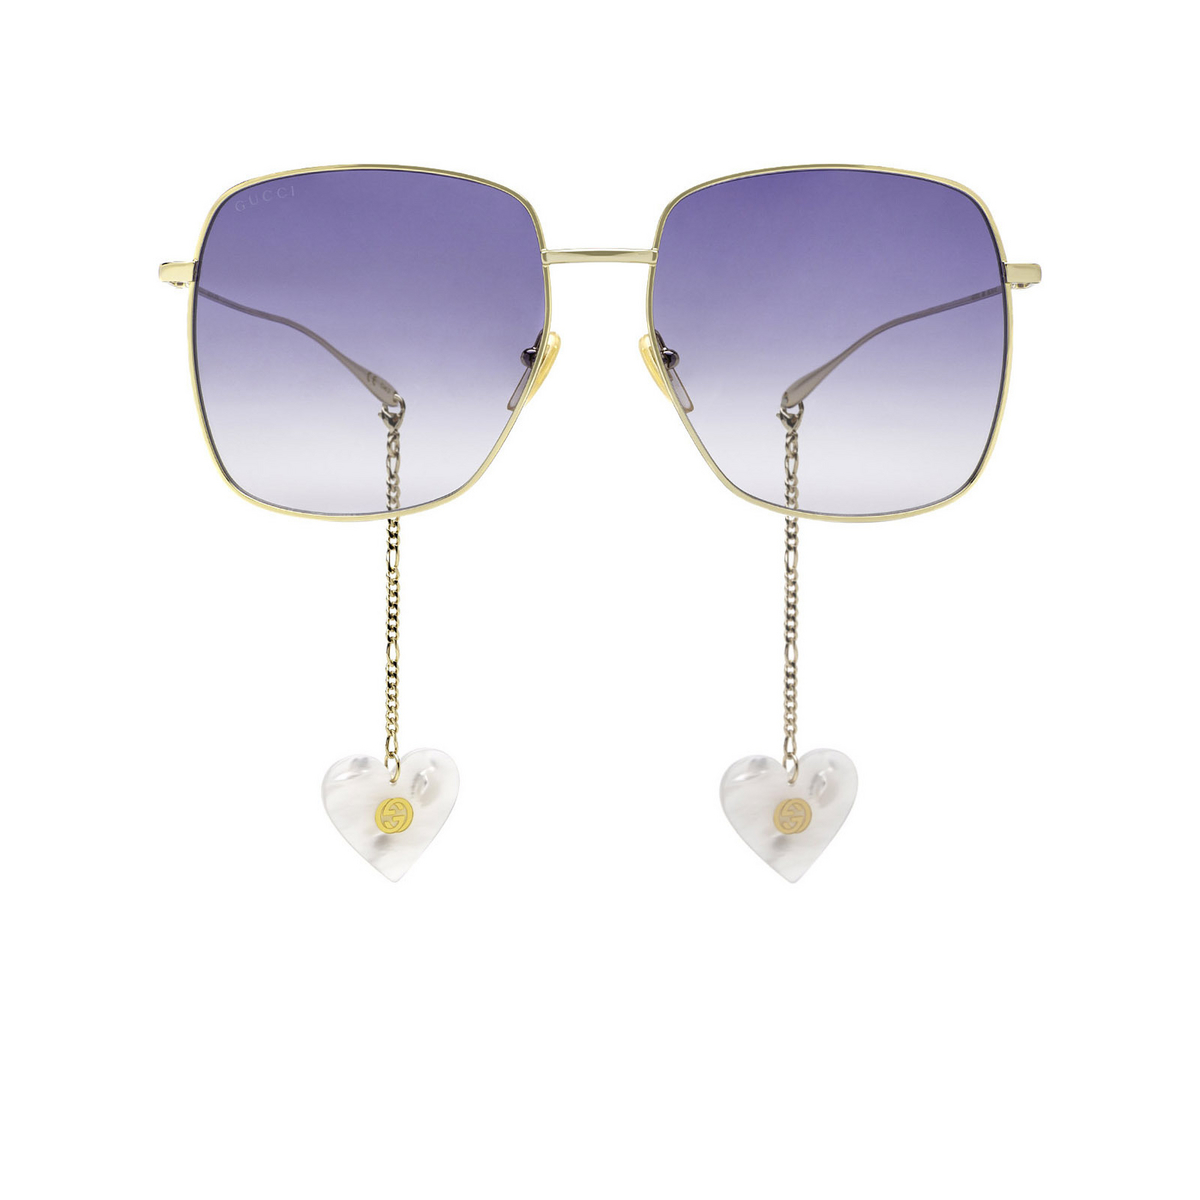 Gucci® Square Sunglasses: GG1031S color Gold 004 - front view.